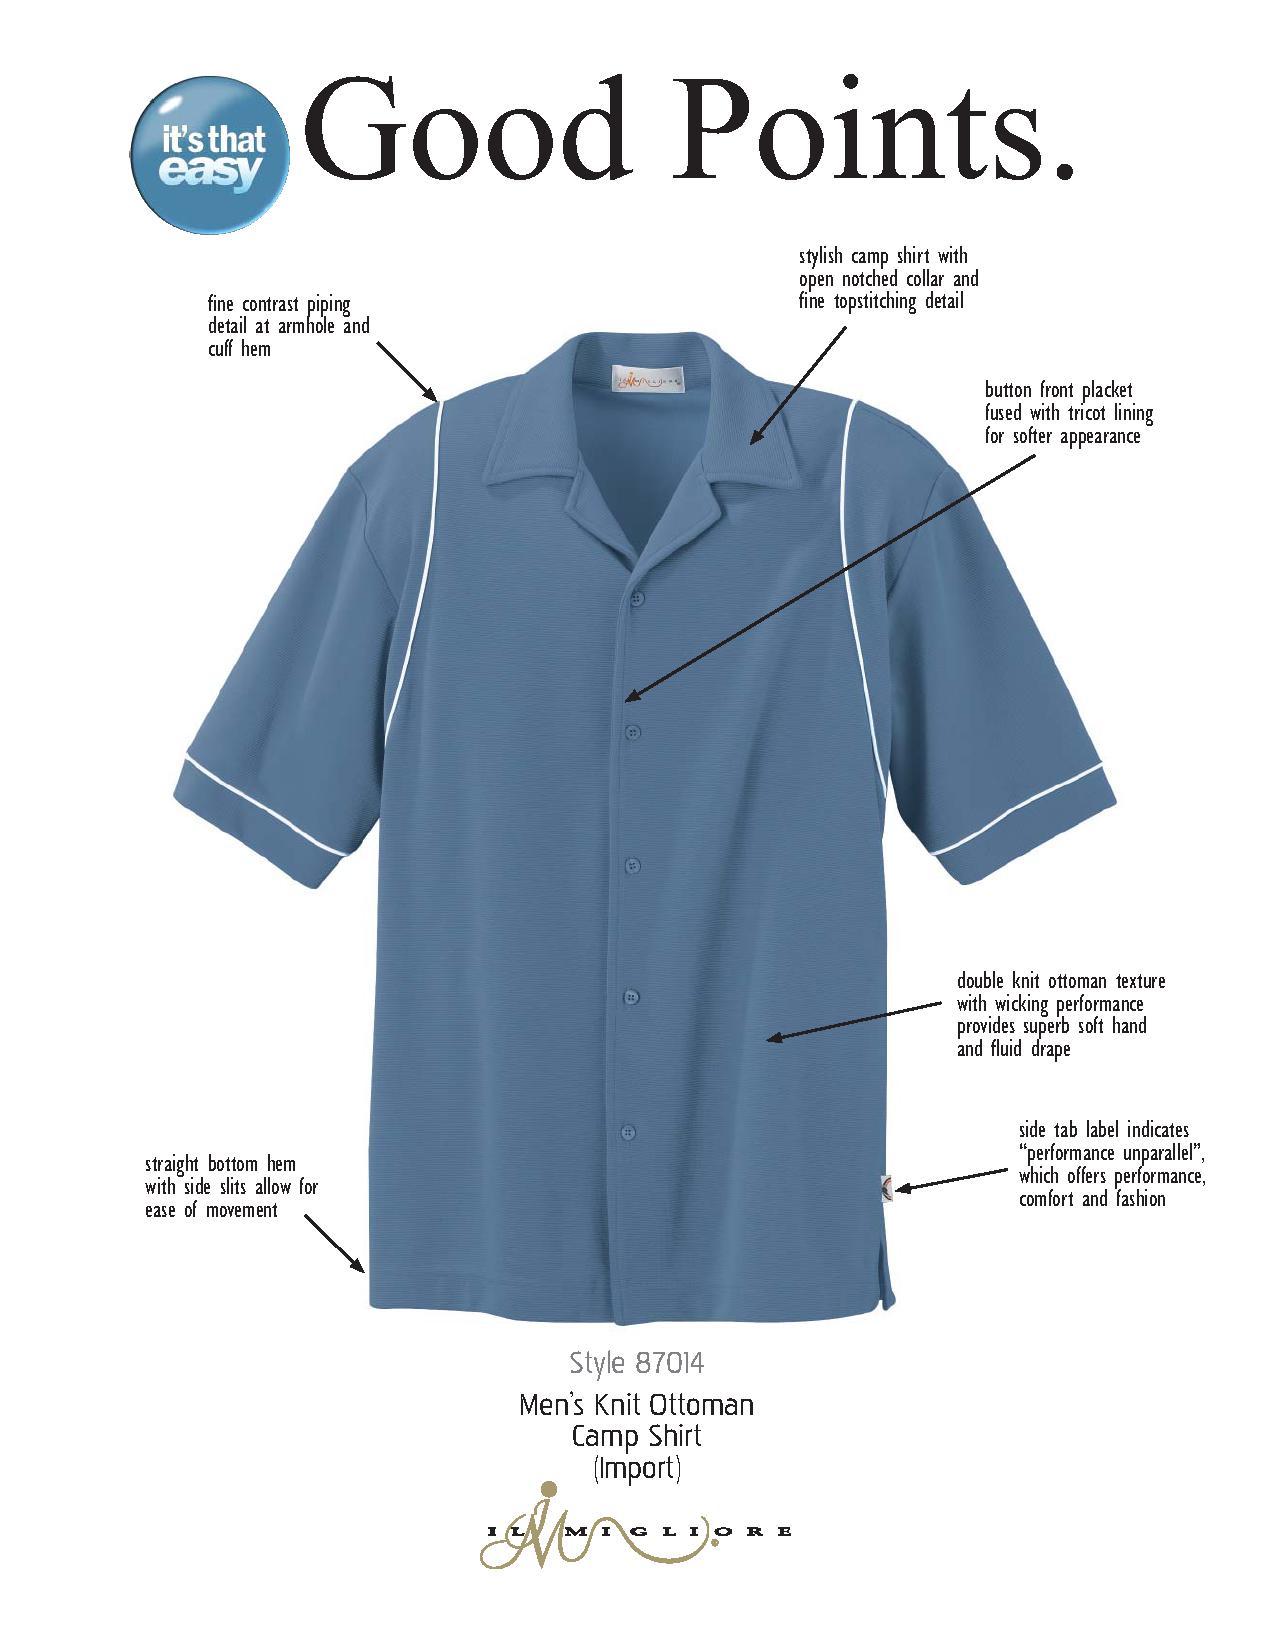 Ash City Performance 87014 - Men's Knit Ottoman Camp Shirt